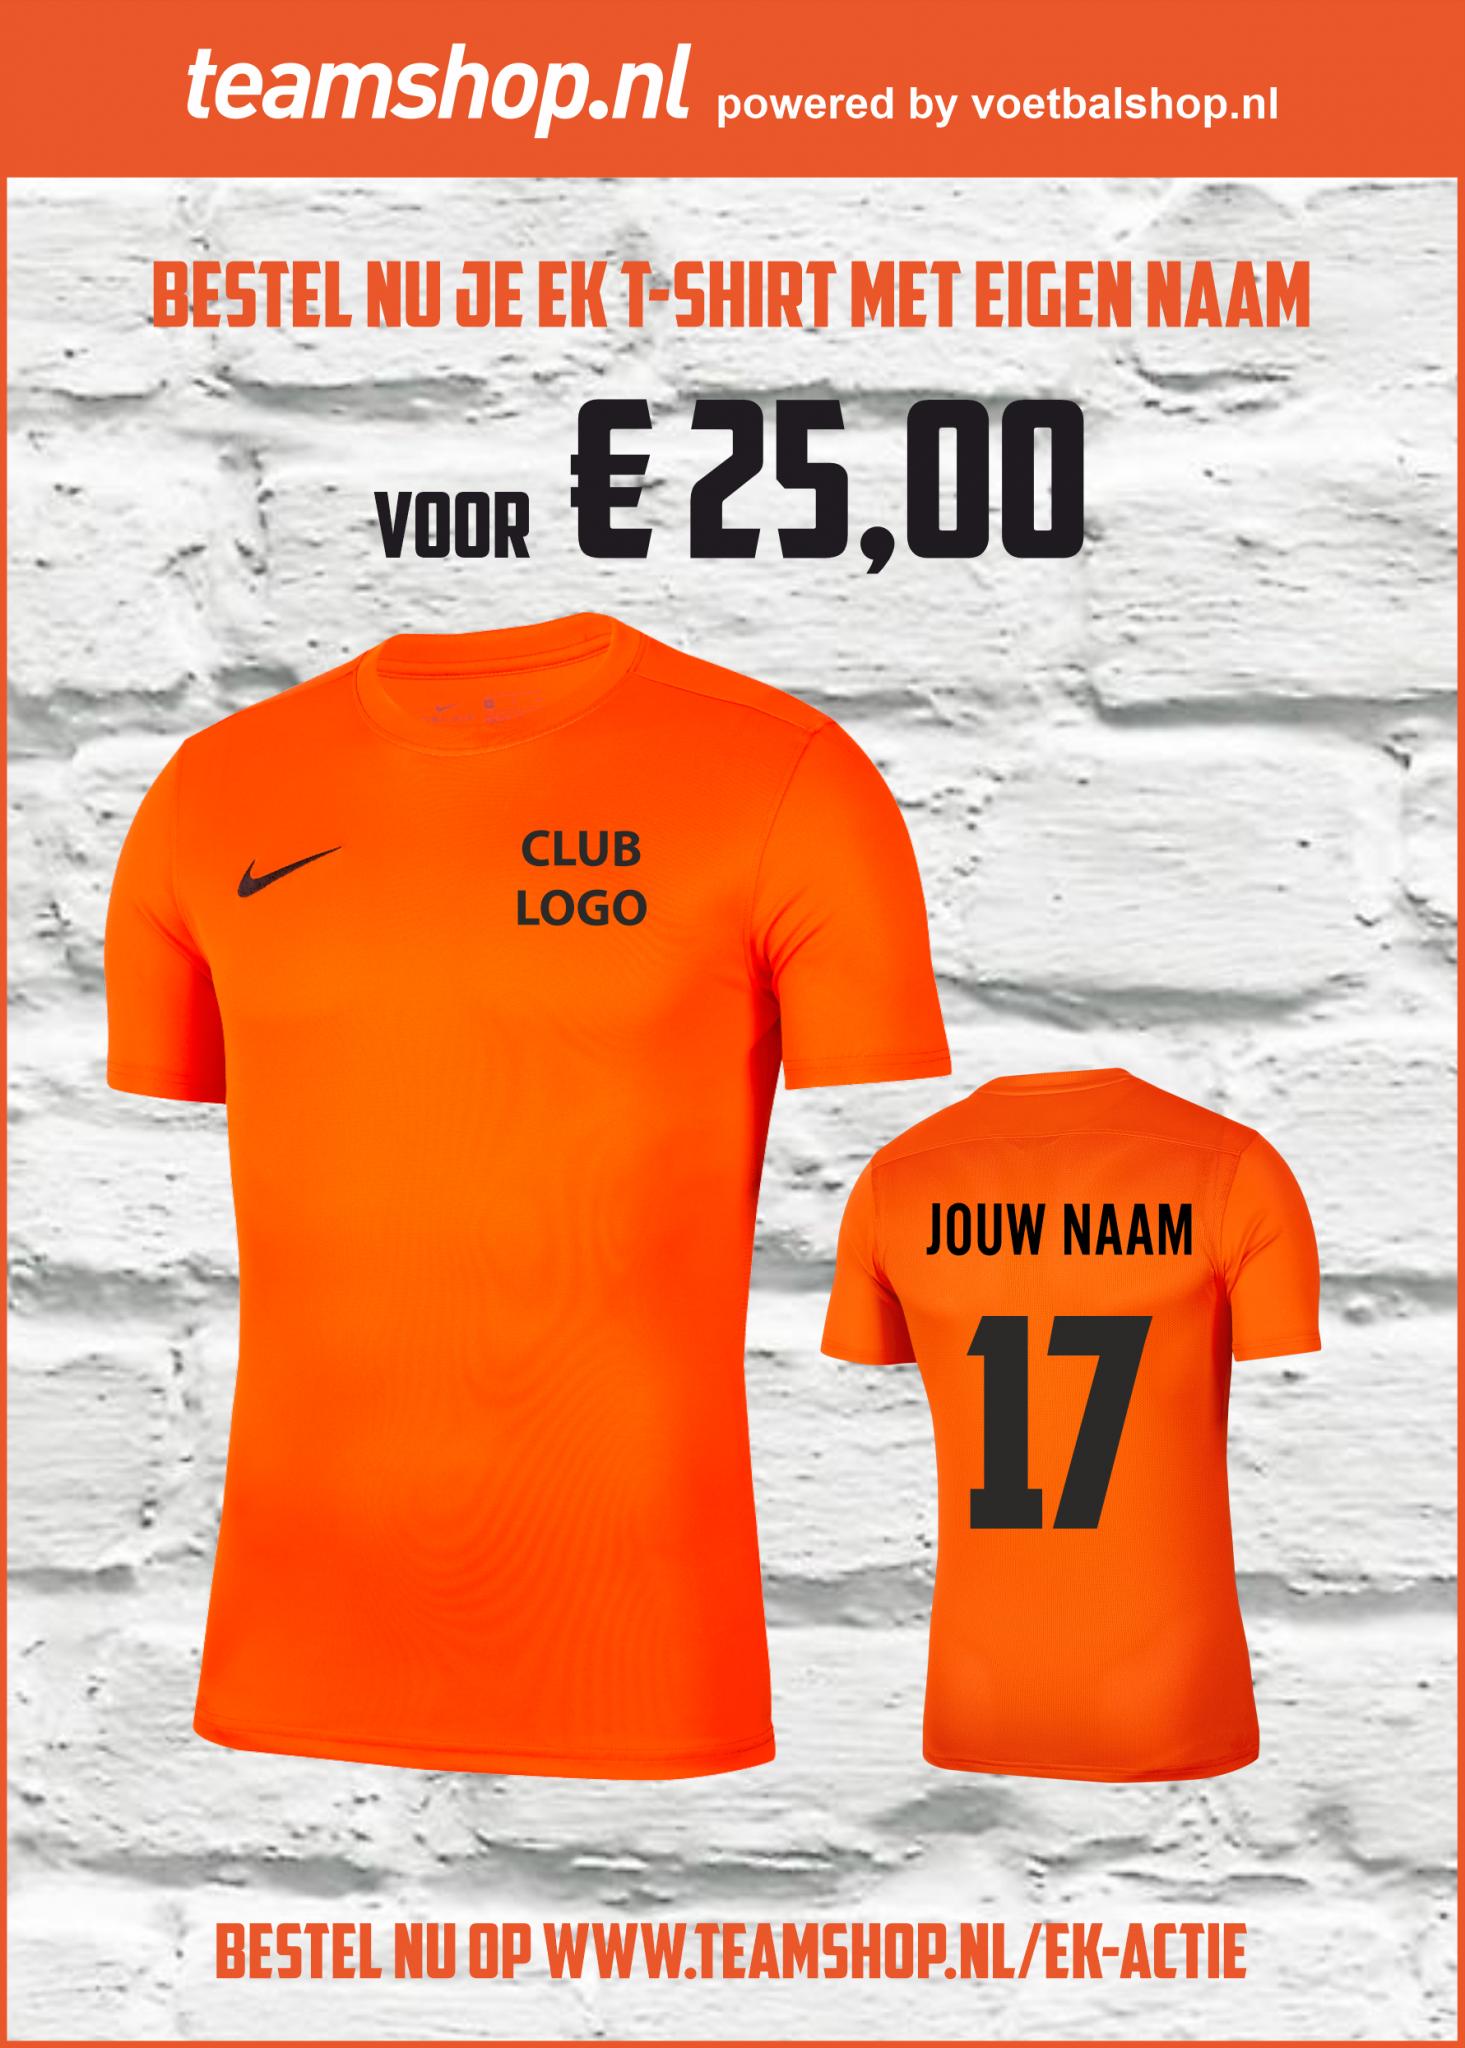 Samen winnen met Oranje....